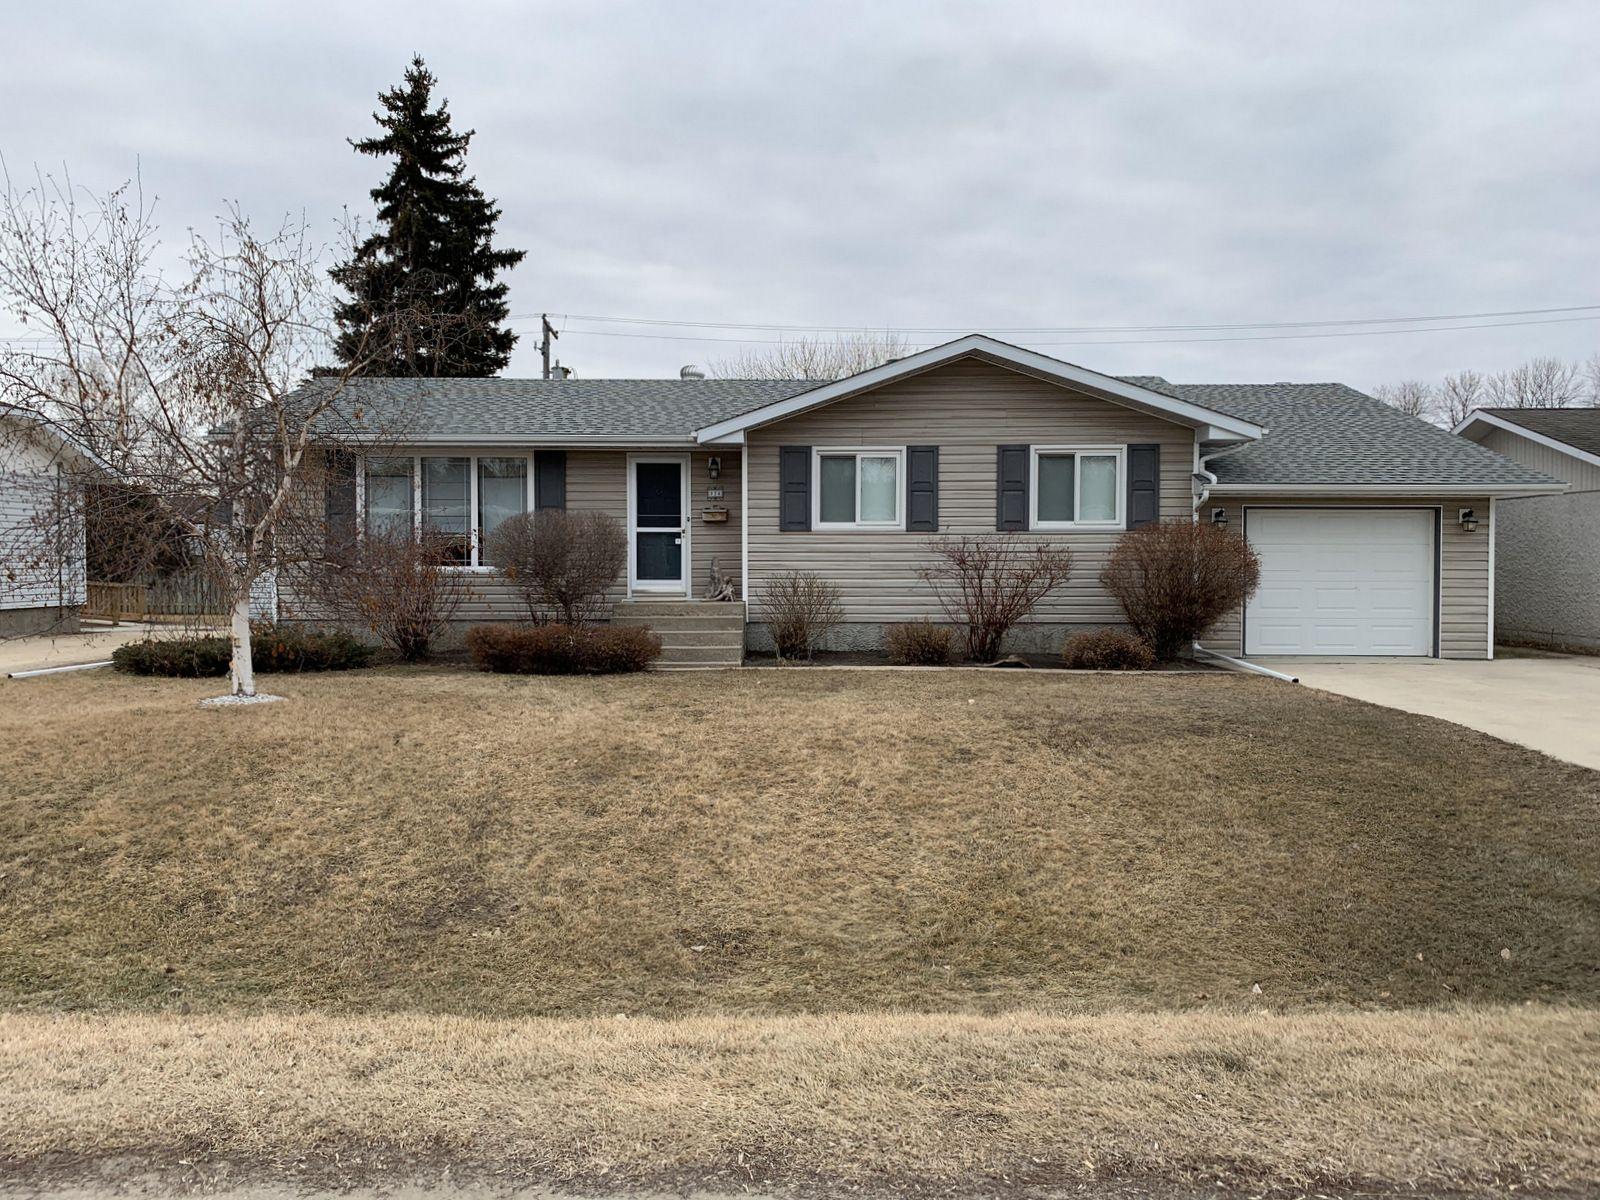 Main Photo: 274 Seneca Street in Portage la Prairie: House for sale : MLS®# 202106505